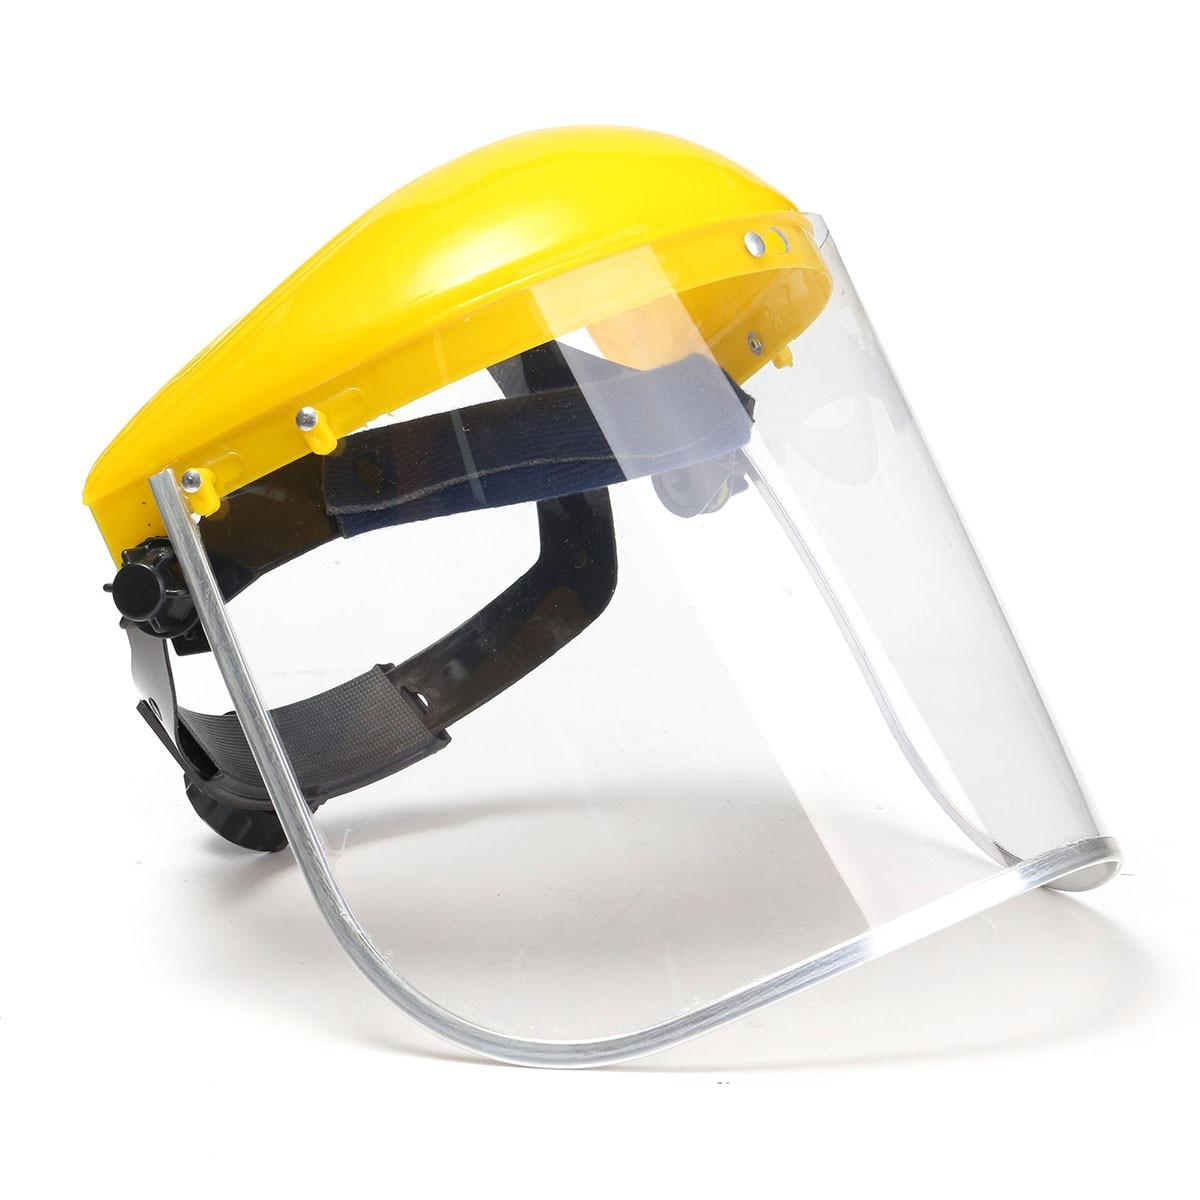 3Pcs White Protective Face Shield /&Visor Full Safety Workwear Eye Protection